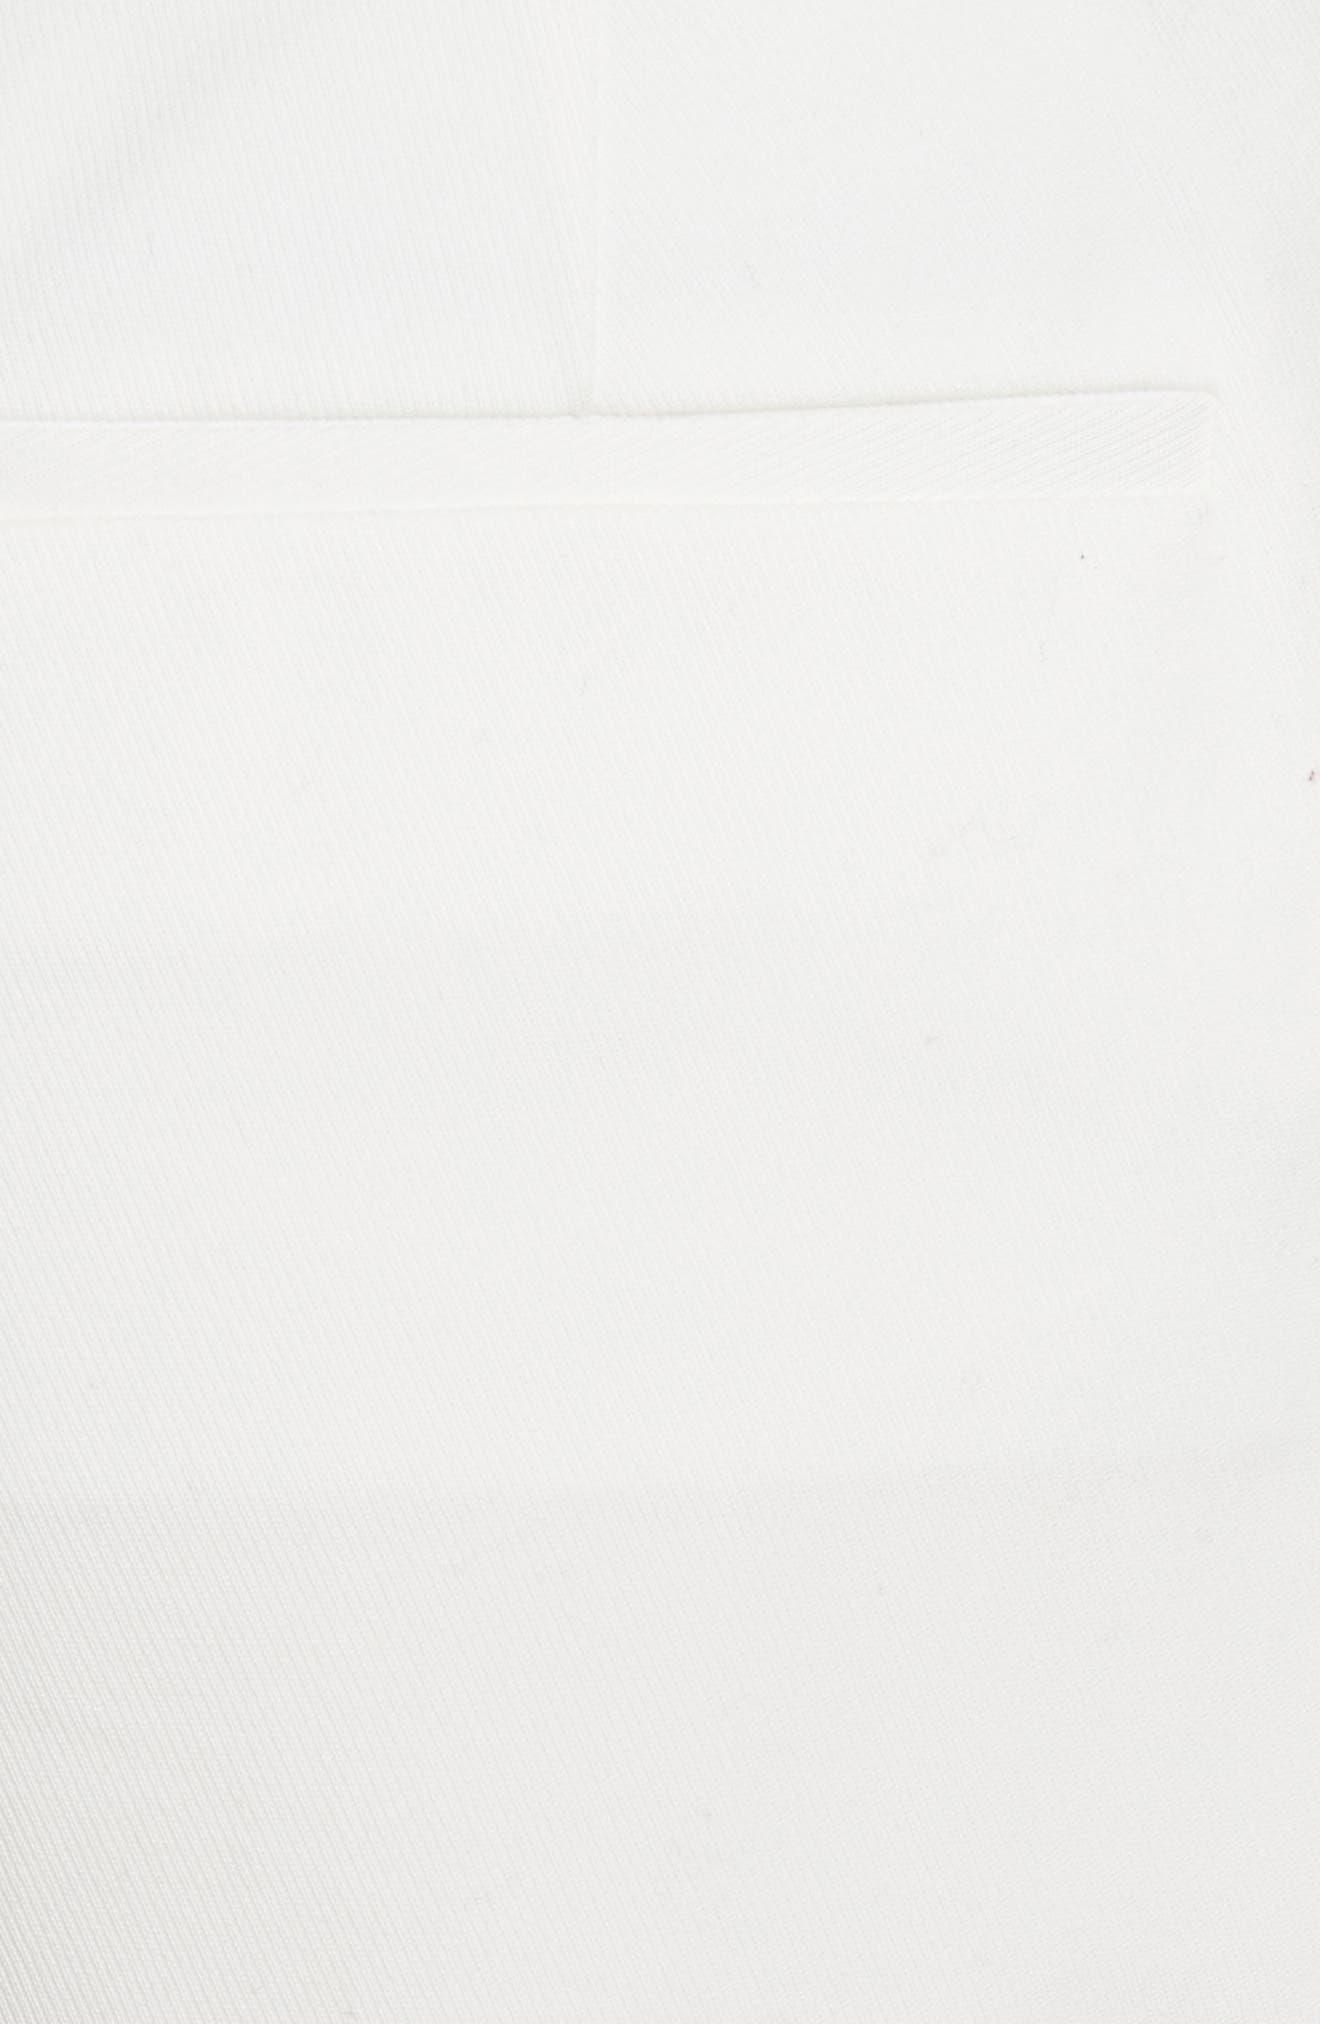 GREY Jason Wu Stretch Cotton Sailor Shorts,                             Alternate thumbnail 5, color,                             110